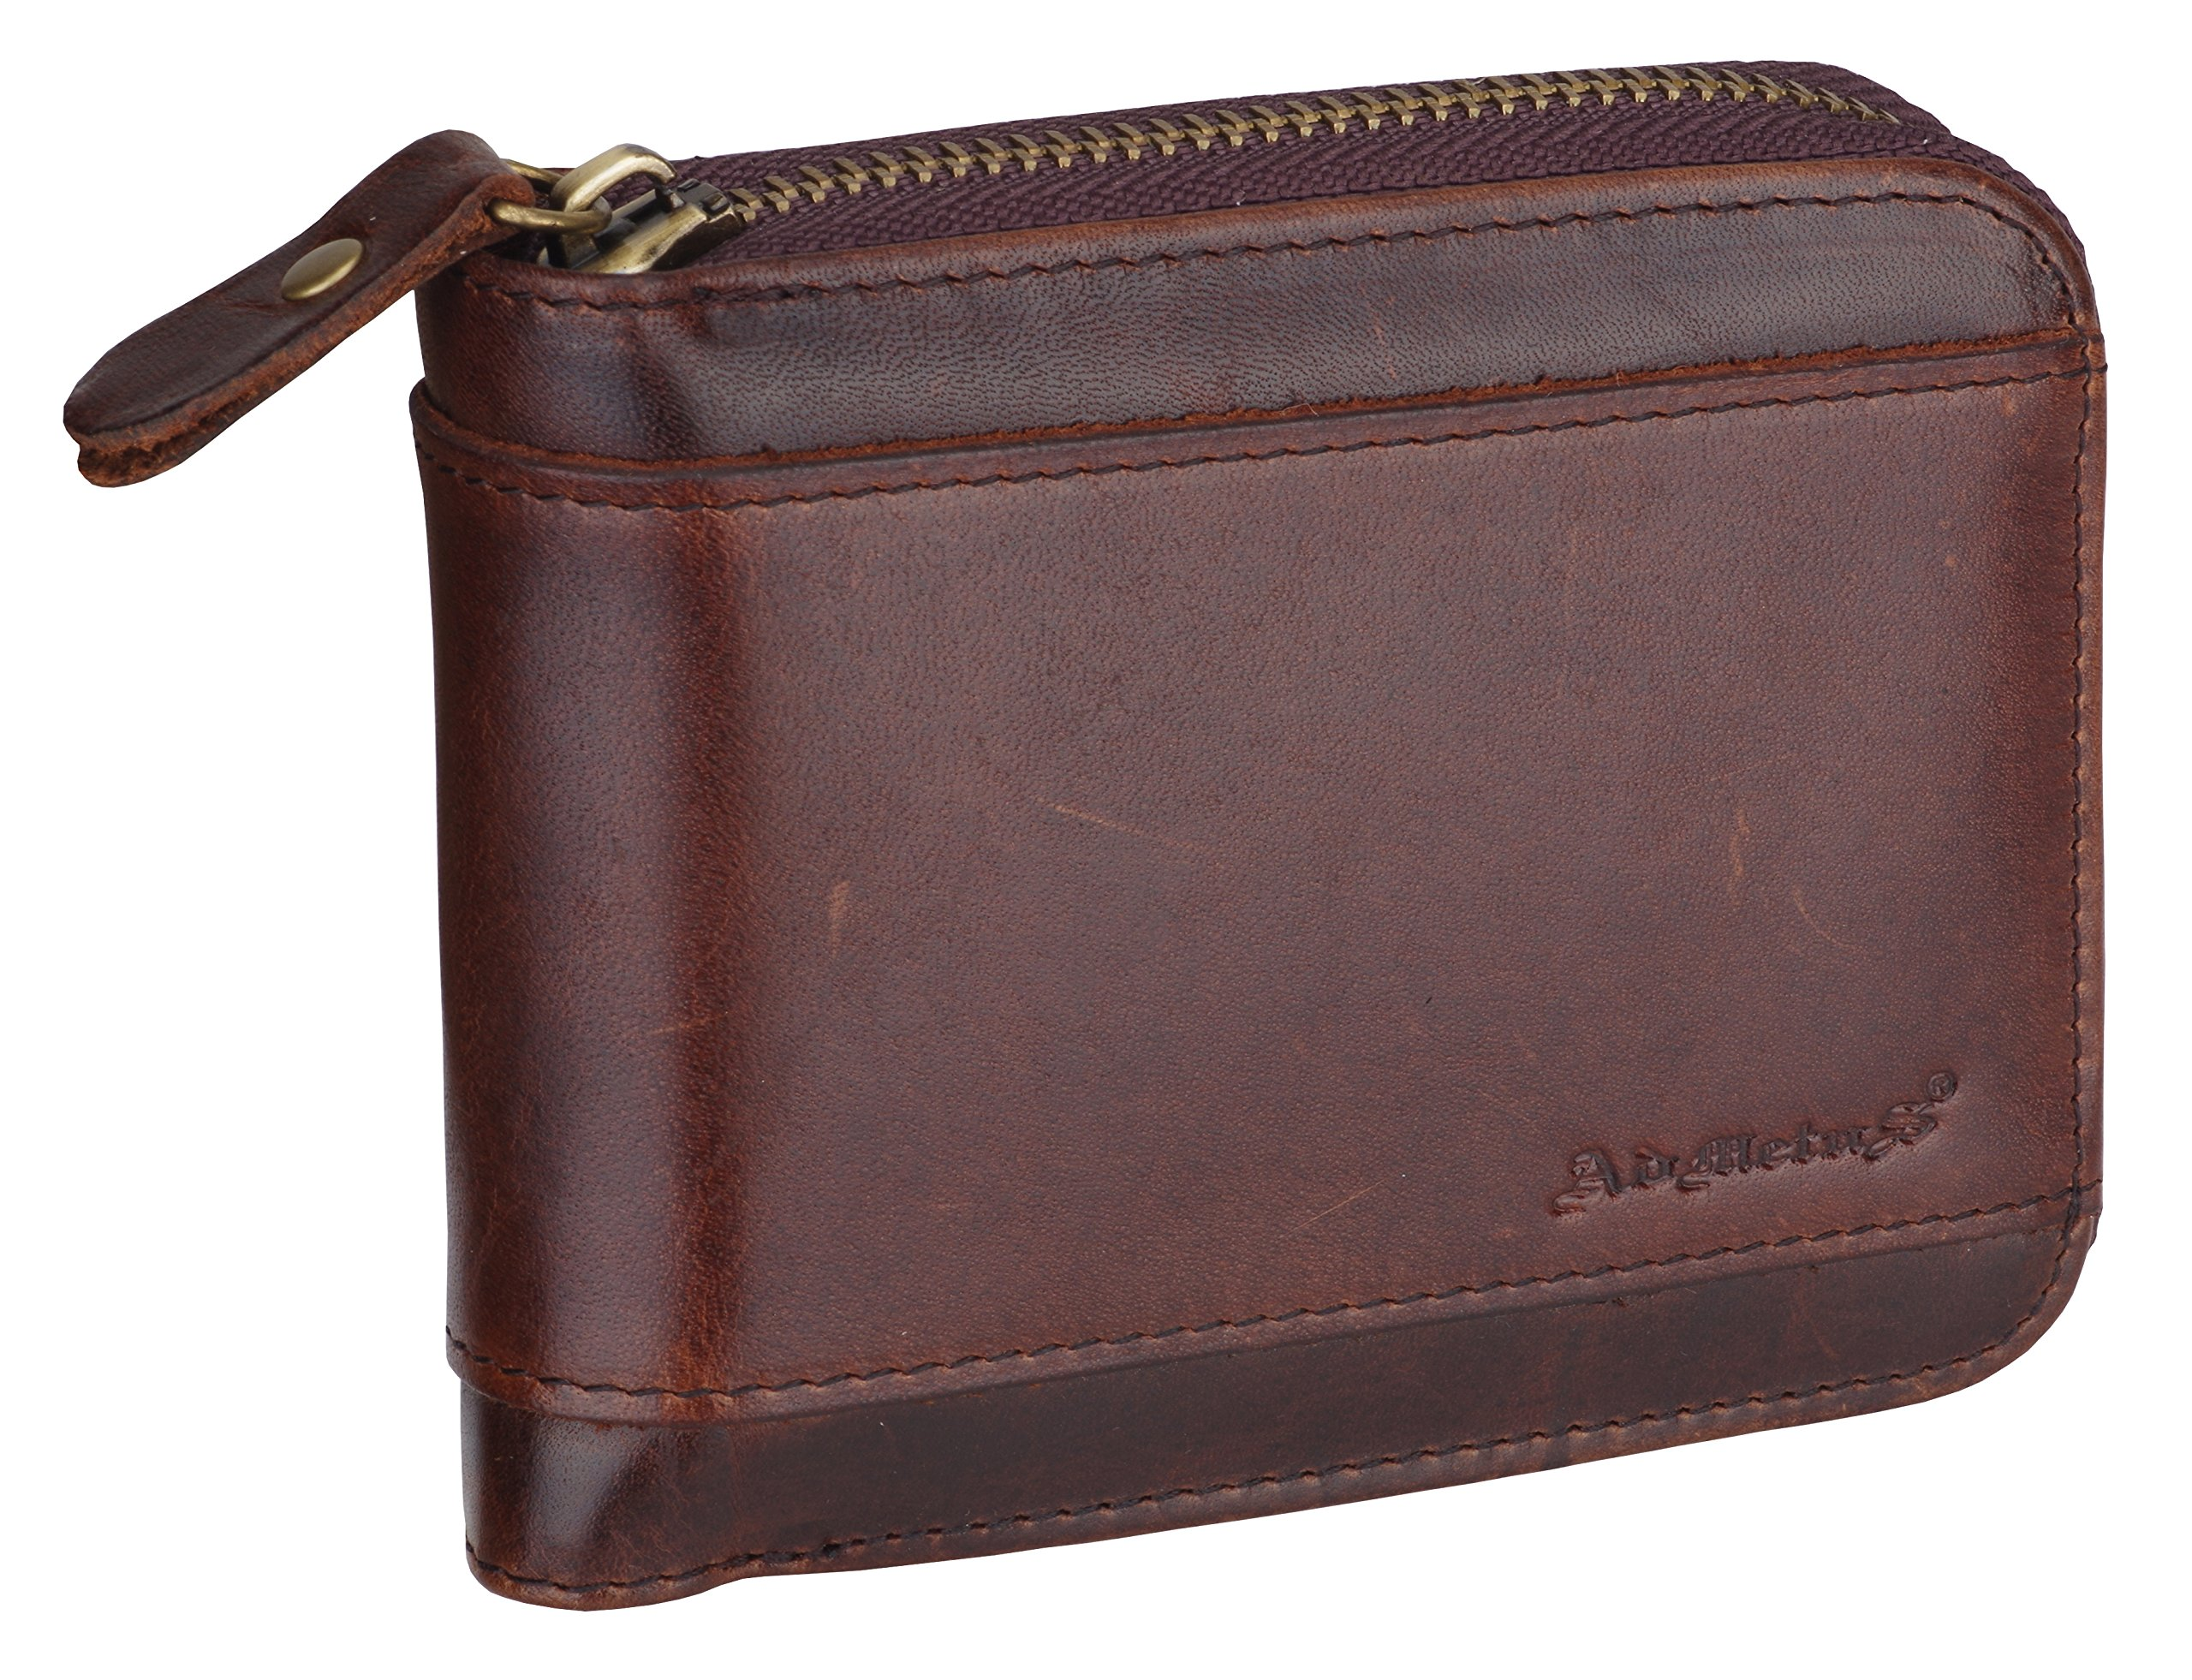 Christmas gifts Admetus Men's Genuine Leather Short Zip-around Bifold Wallet Box3